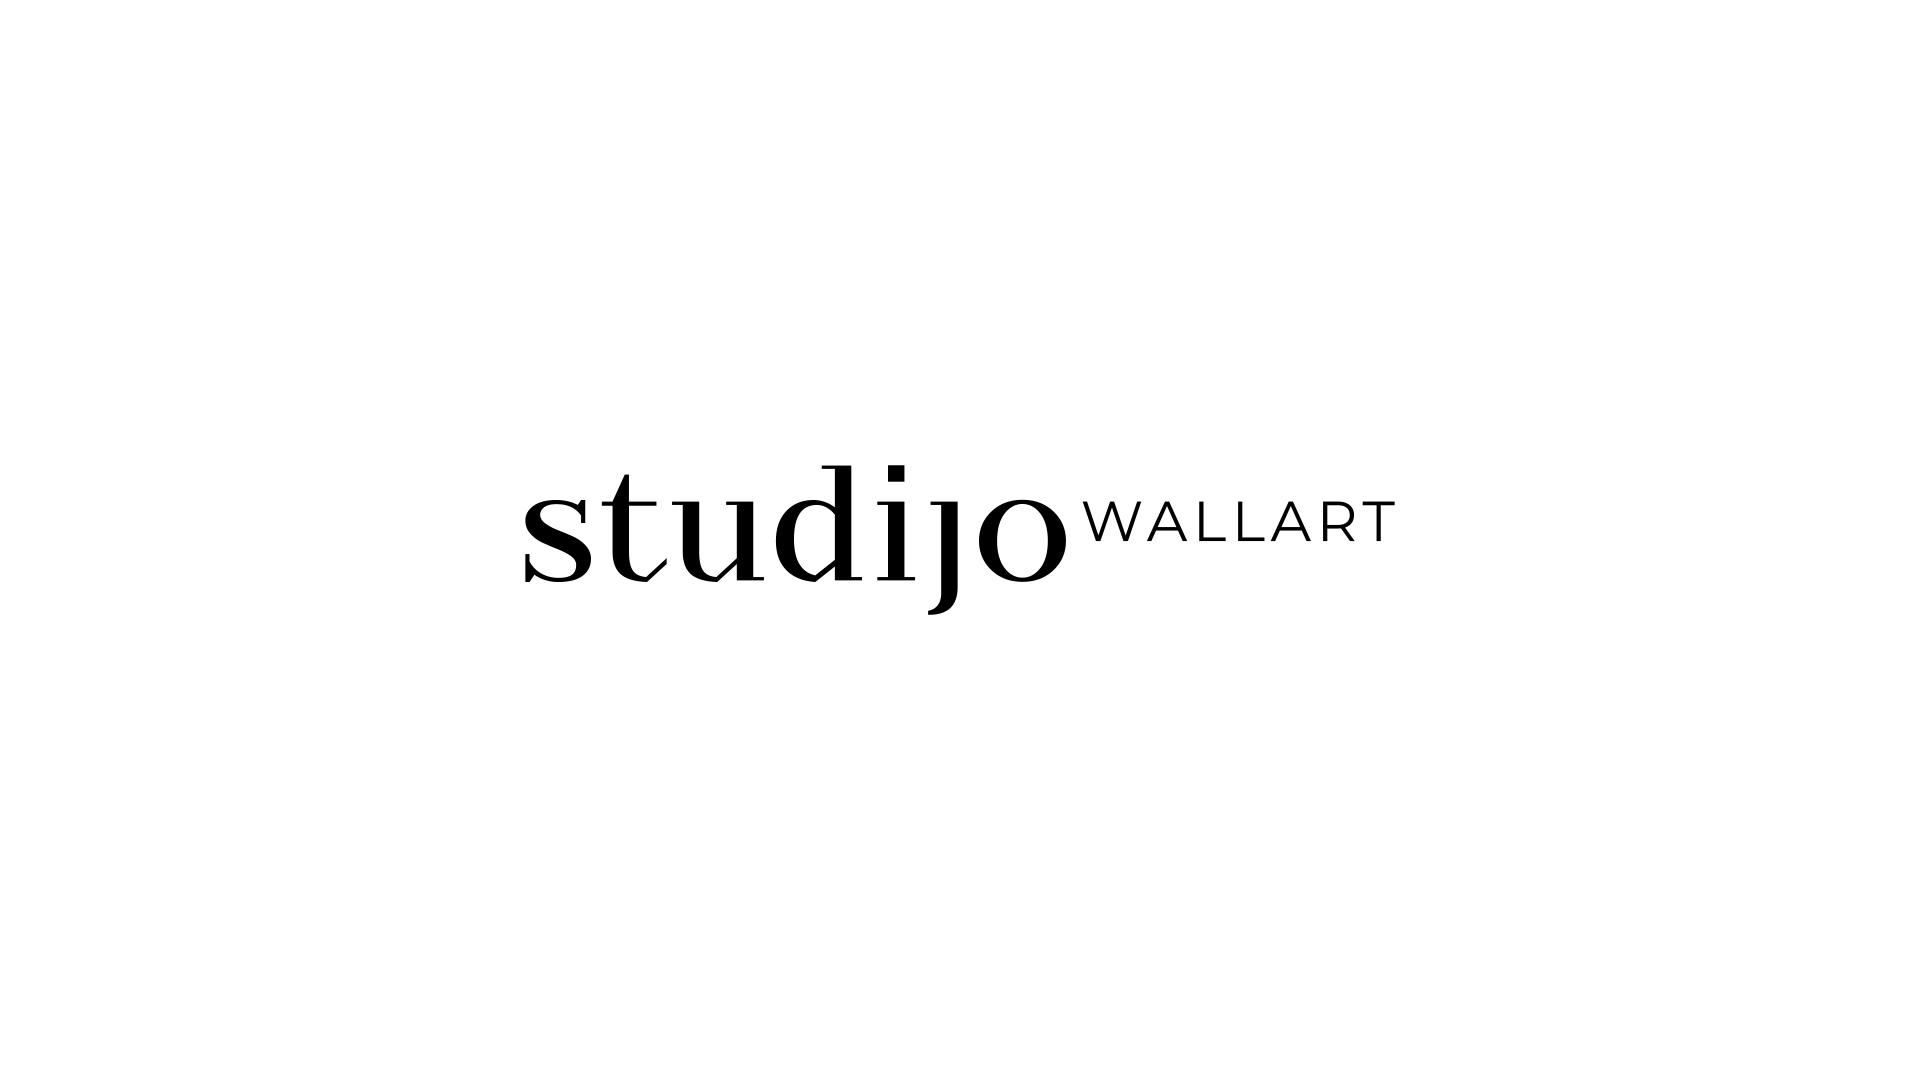 Studijo-Visual-Identity-by-Emtisquare-3